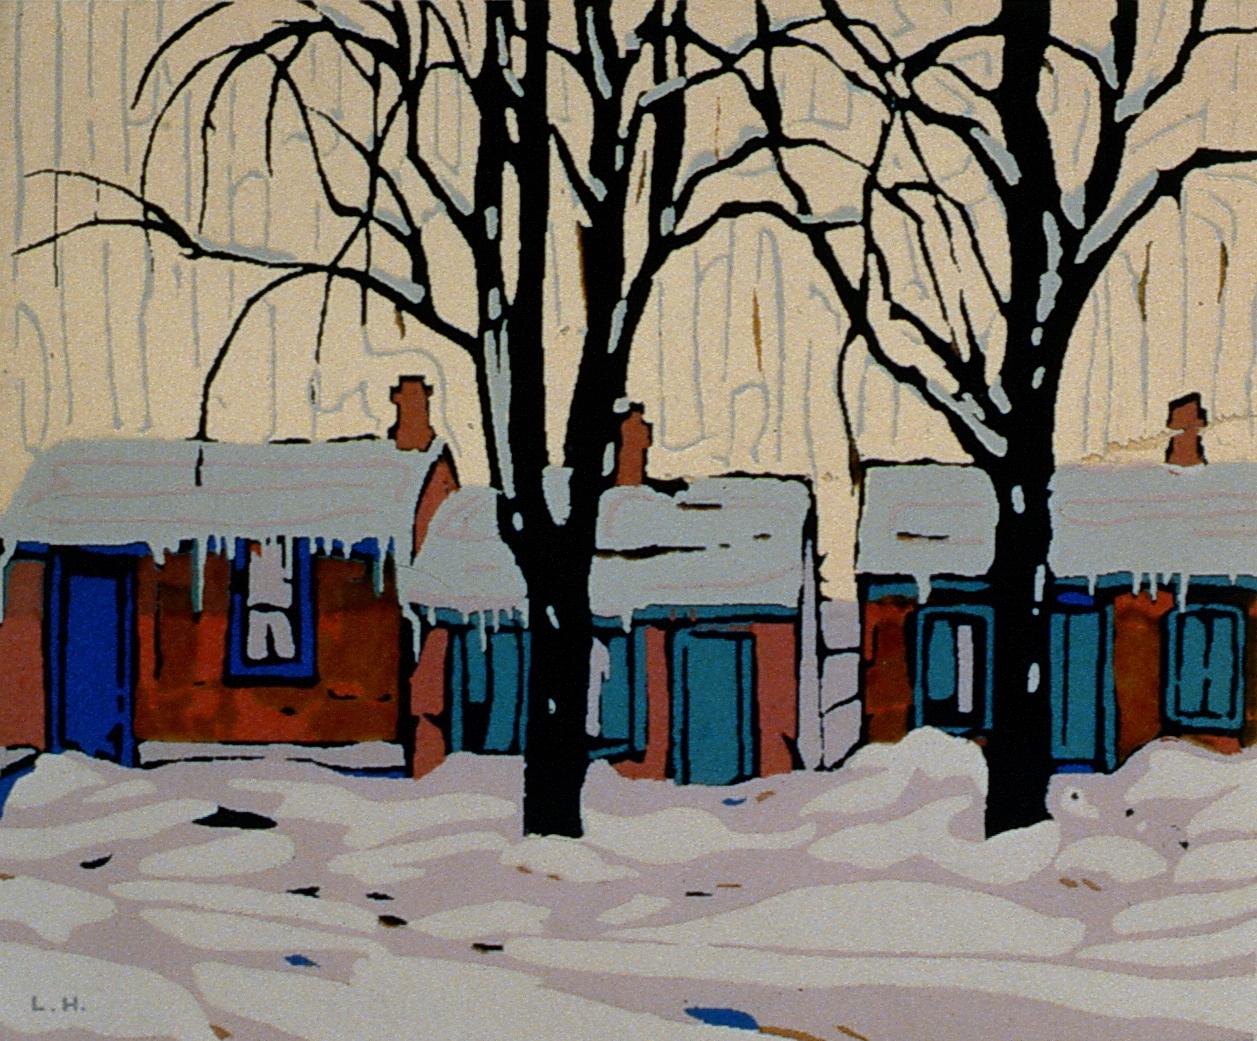 Untitled, Lawren Harris, Serigraph, 1984.02.13